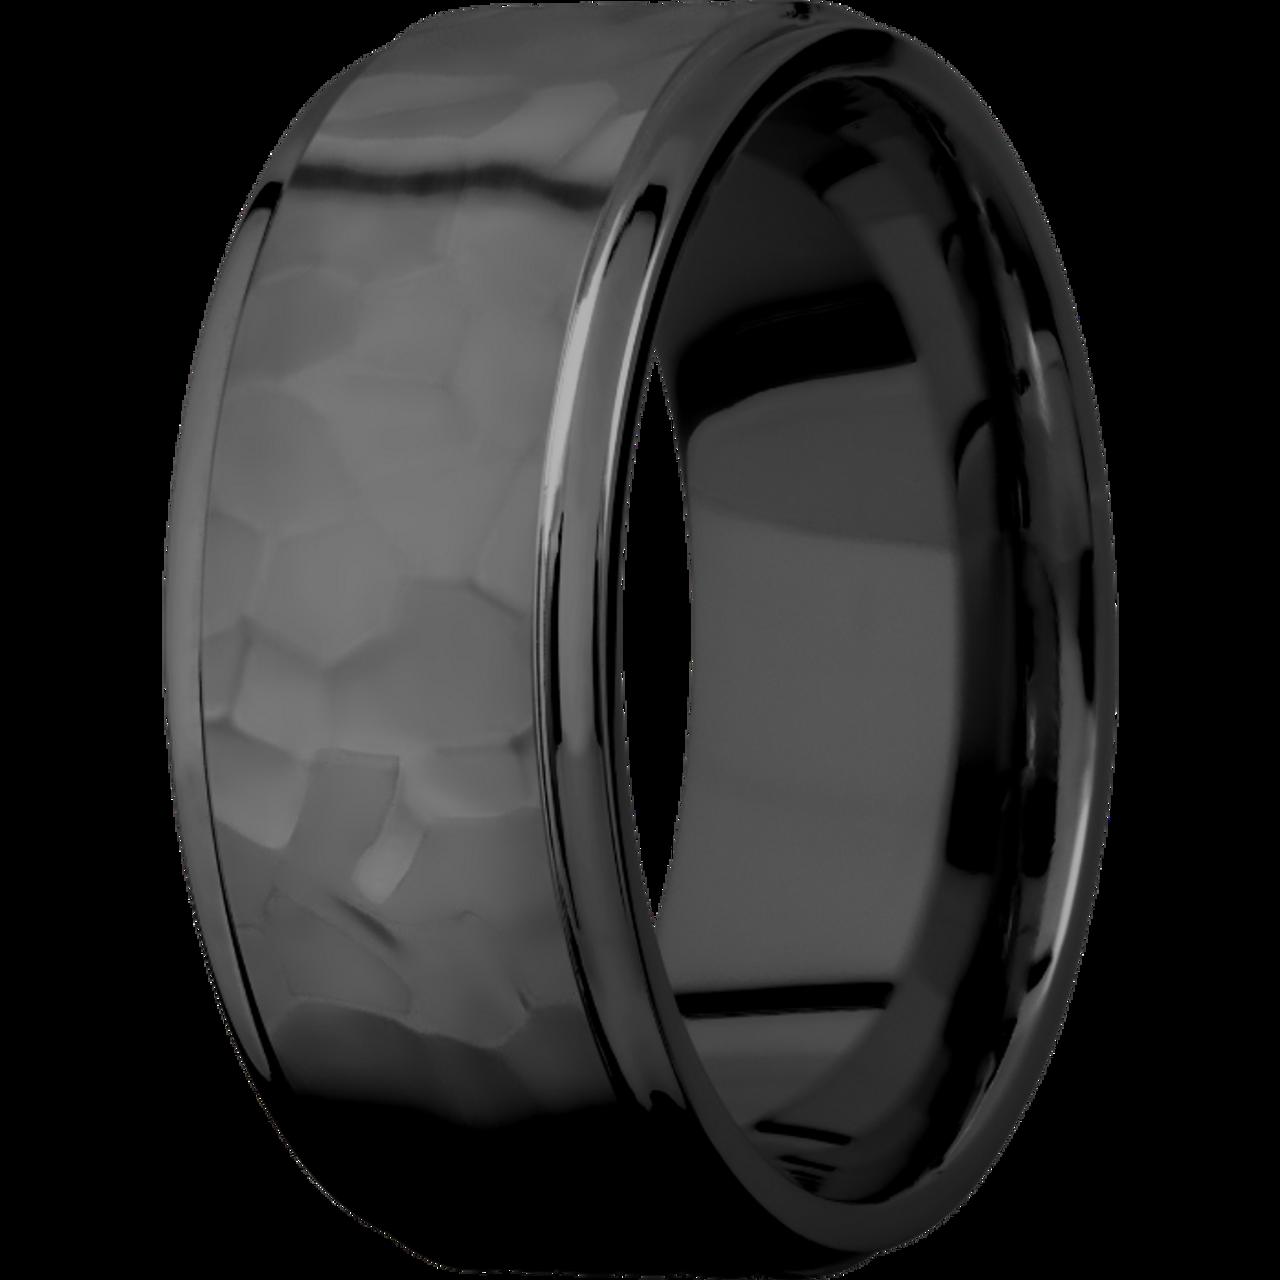 Custom Black Zirconium Tire Tread Rings Rugged Men/'s Rings